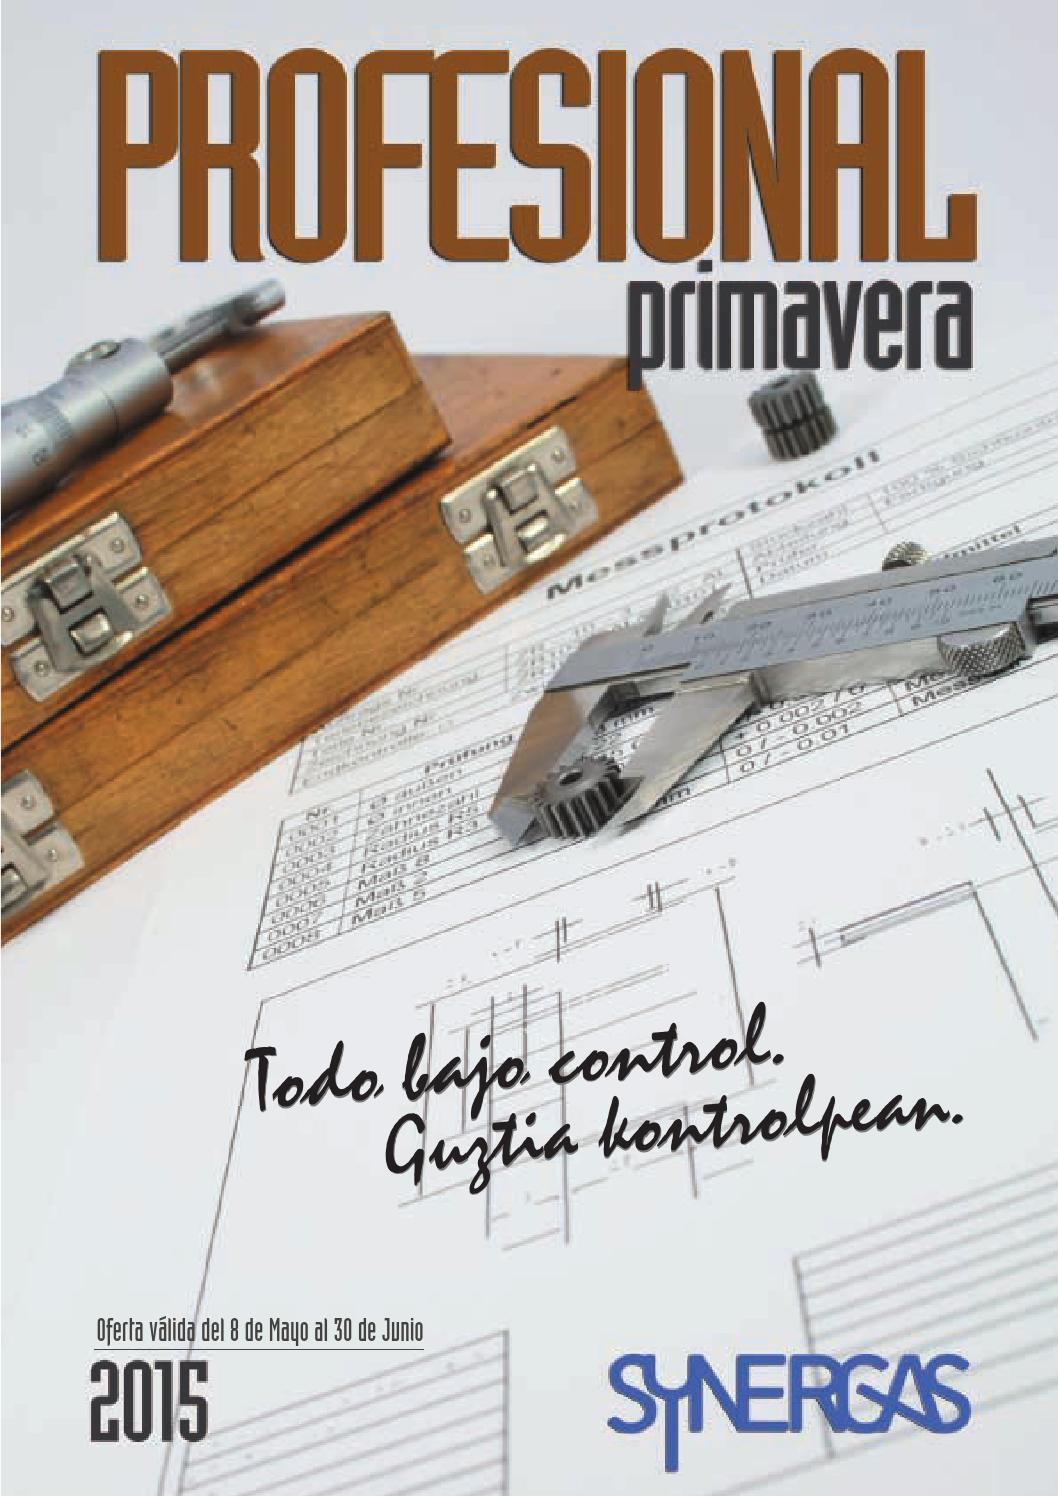 DyNamic Electricistas Cintura Herramienta Cintur/ón Bolsa Destornillador Atornillador Porta Malet/ín